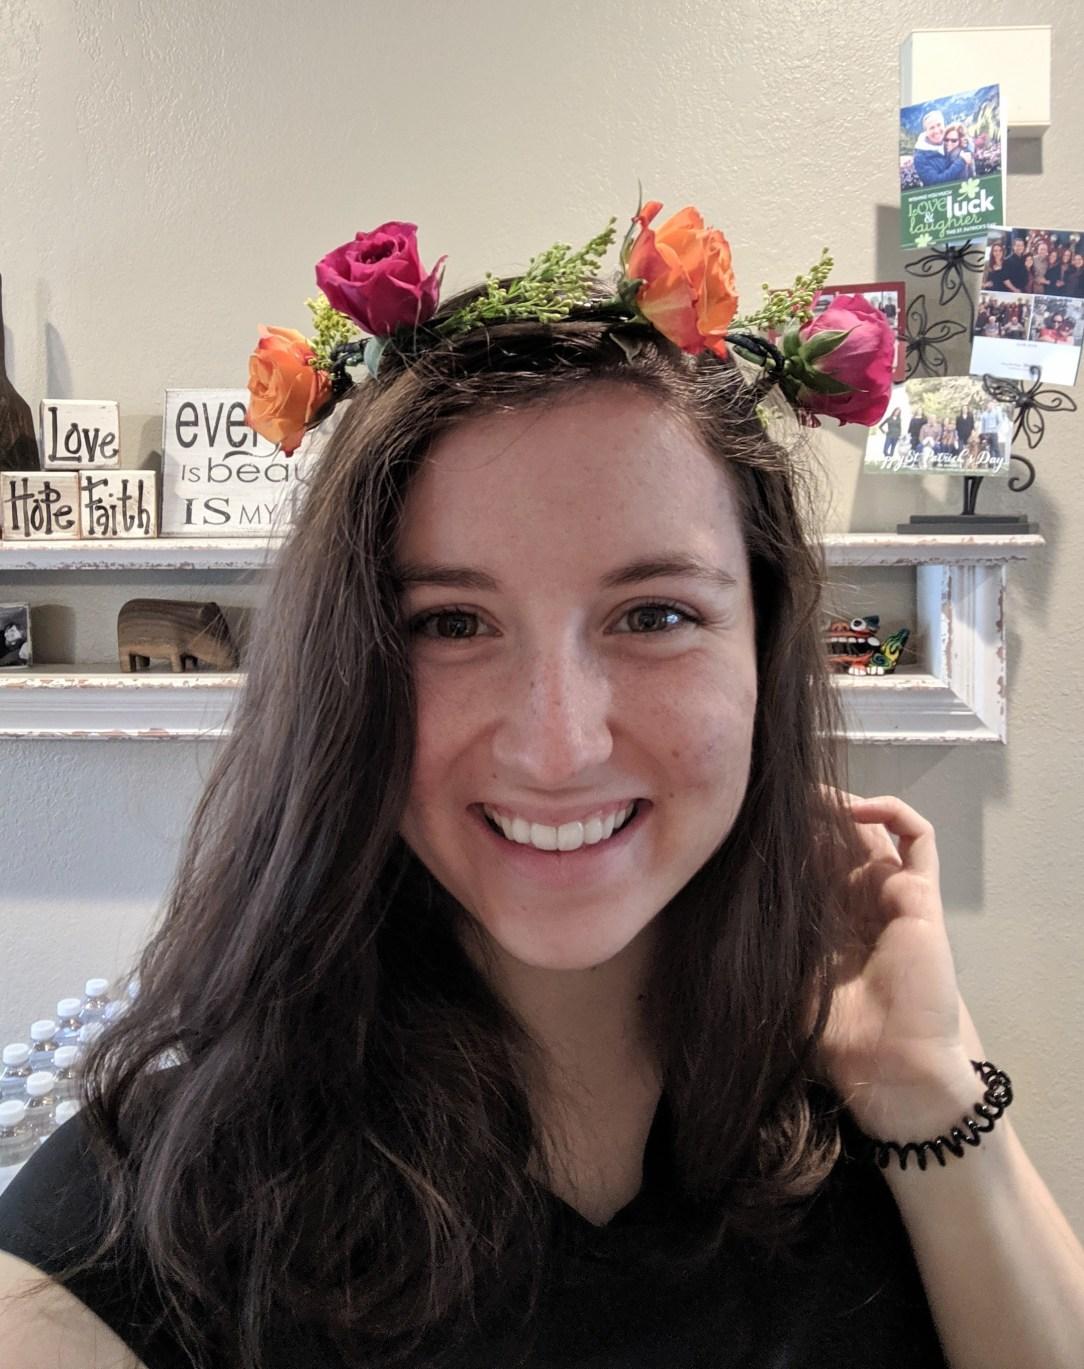 Flower crown, roses, hair accessories, flower headband, living flower c